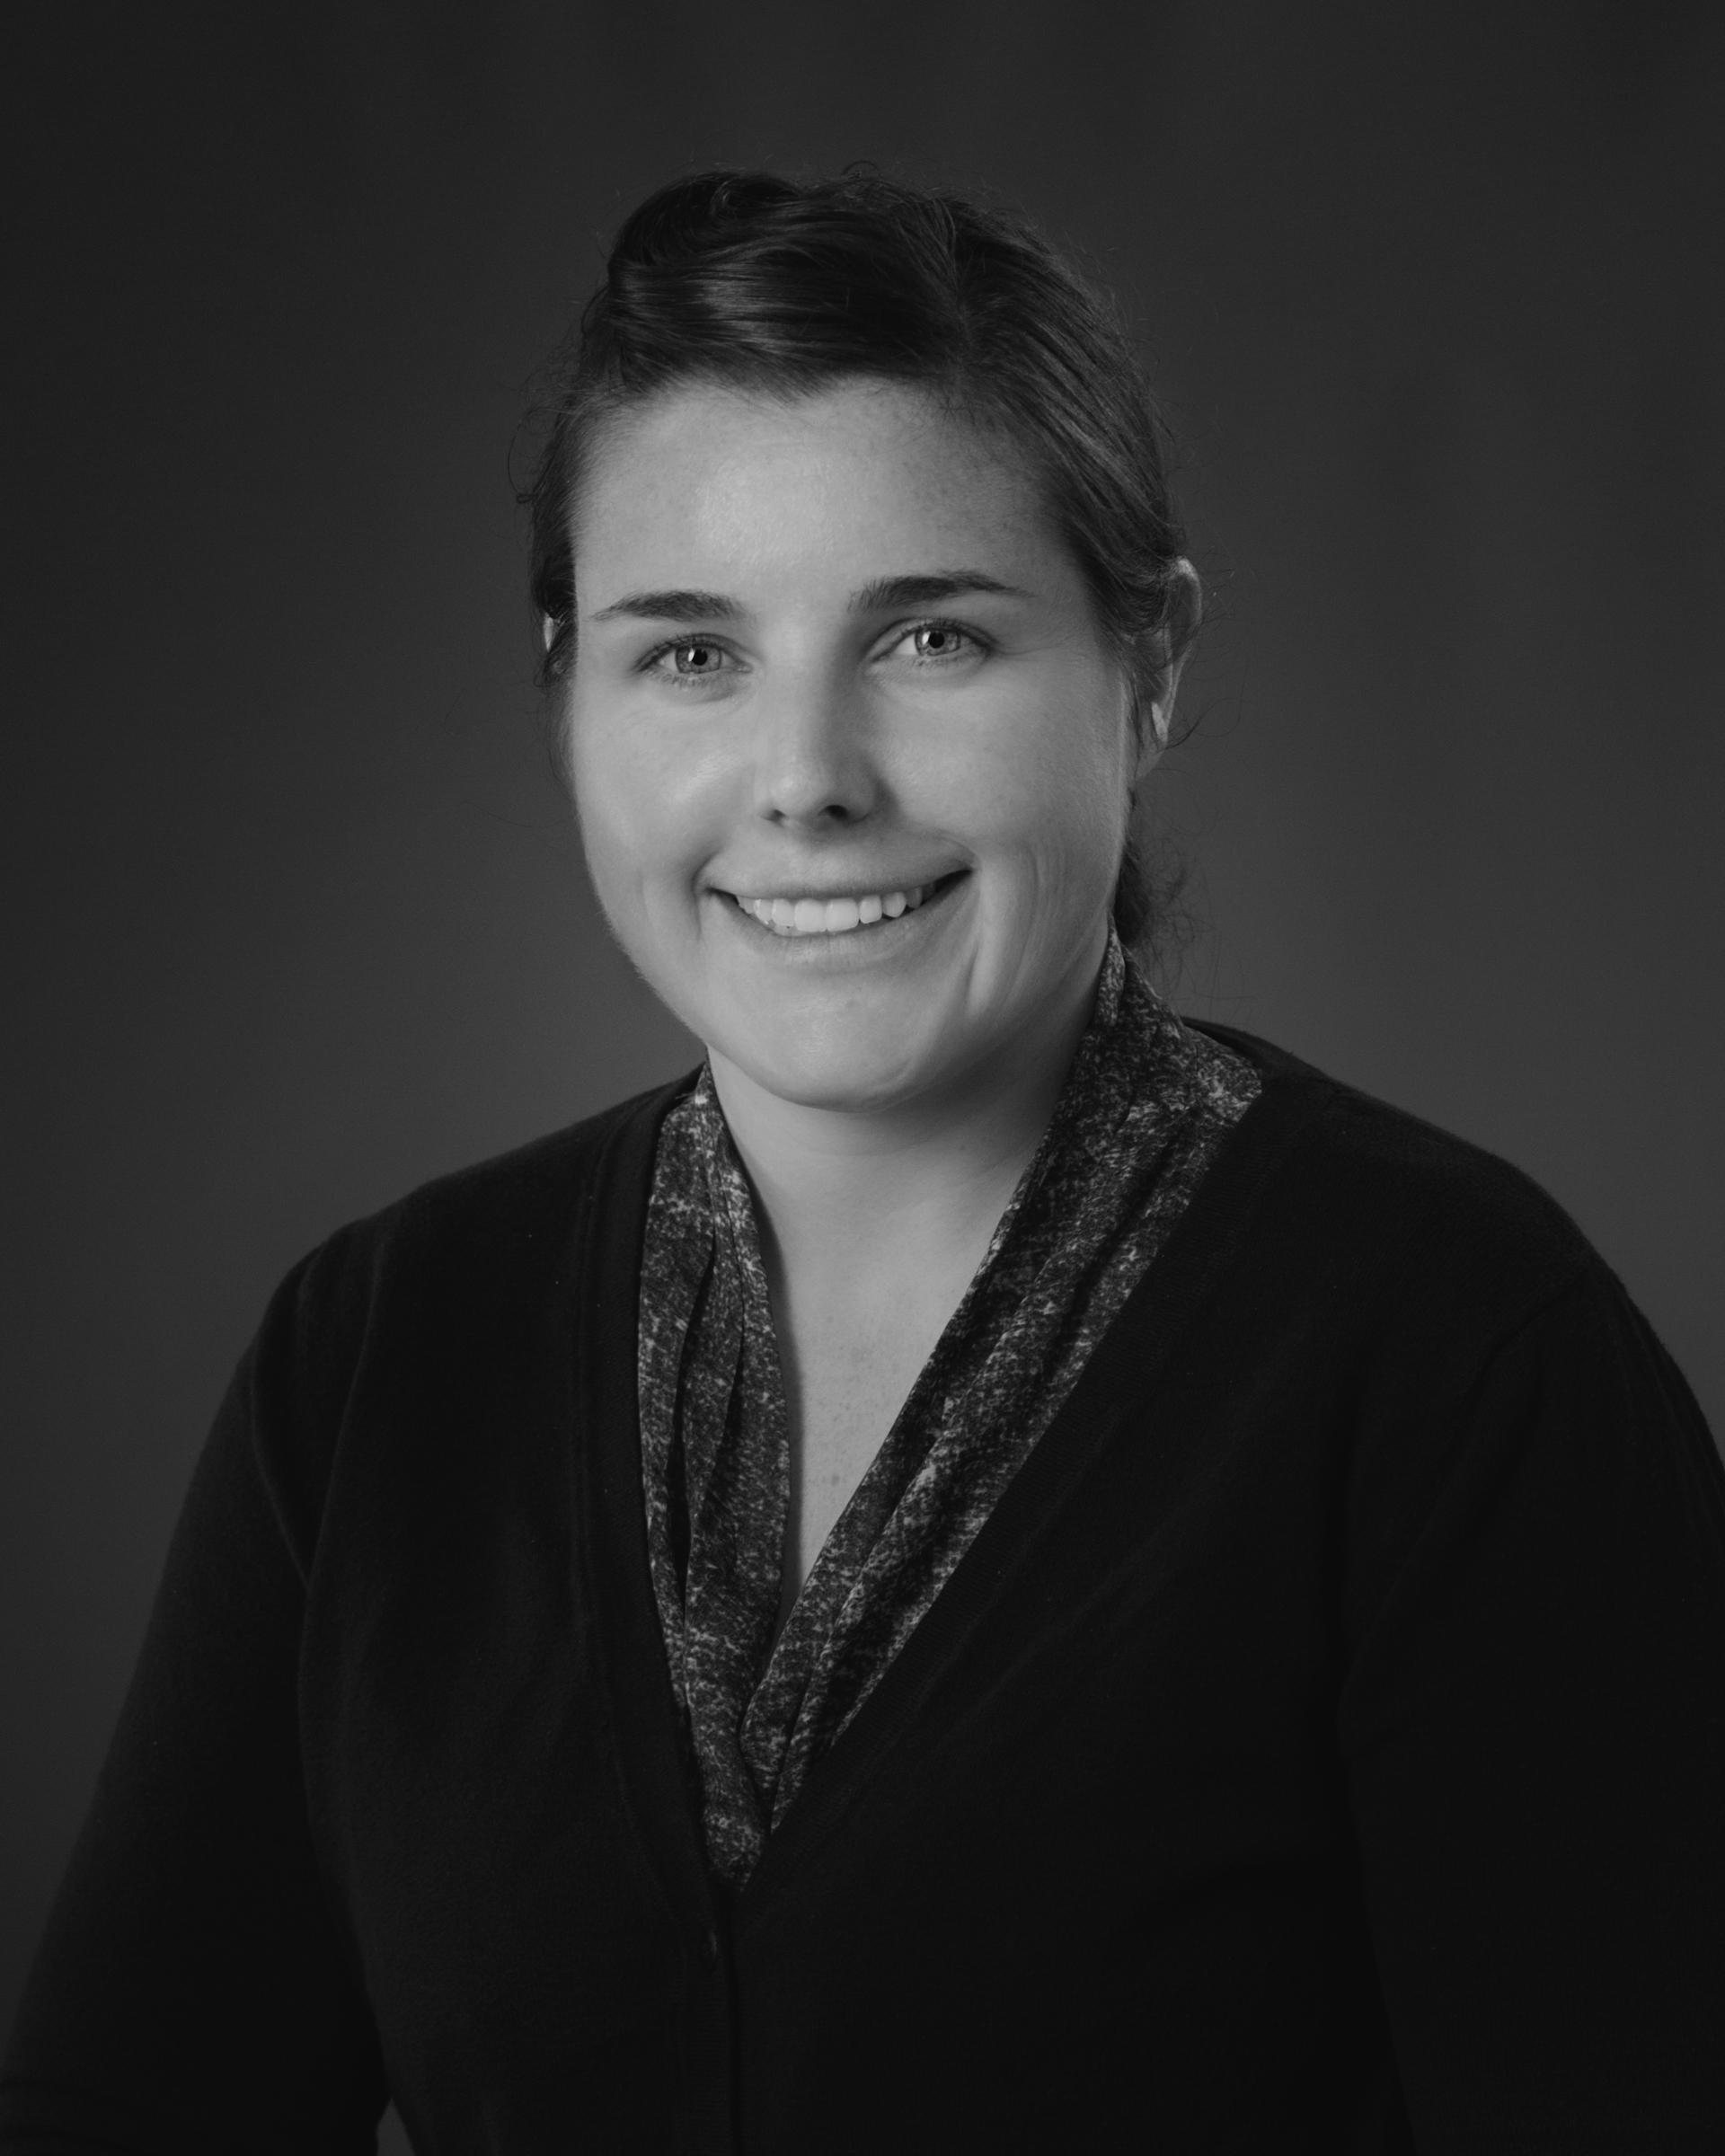 Amanda Colucci